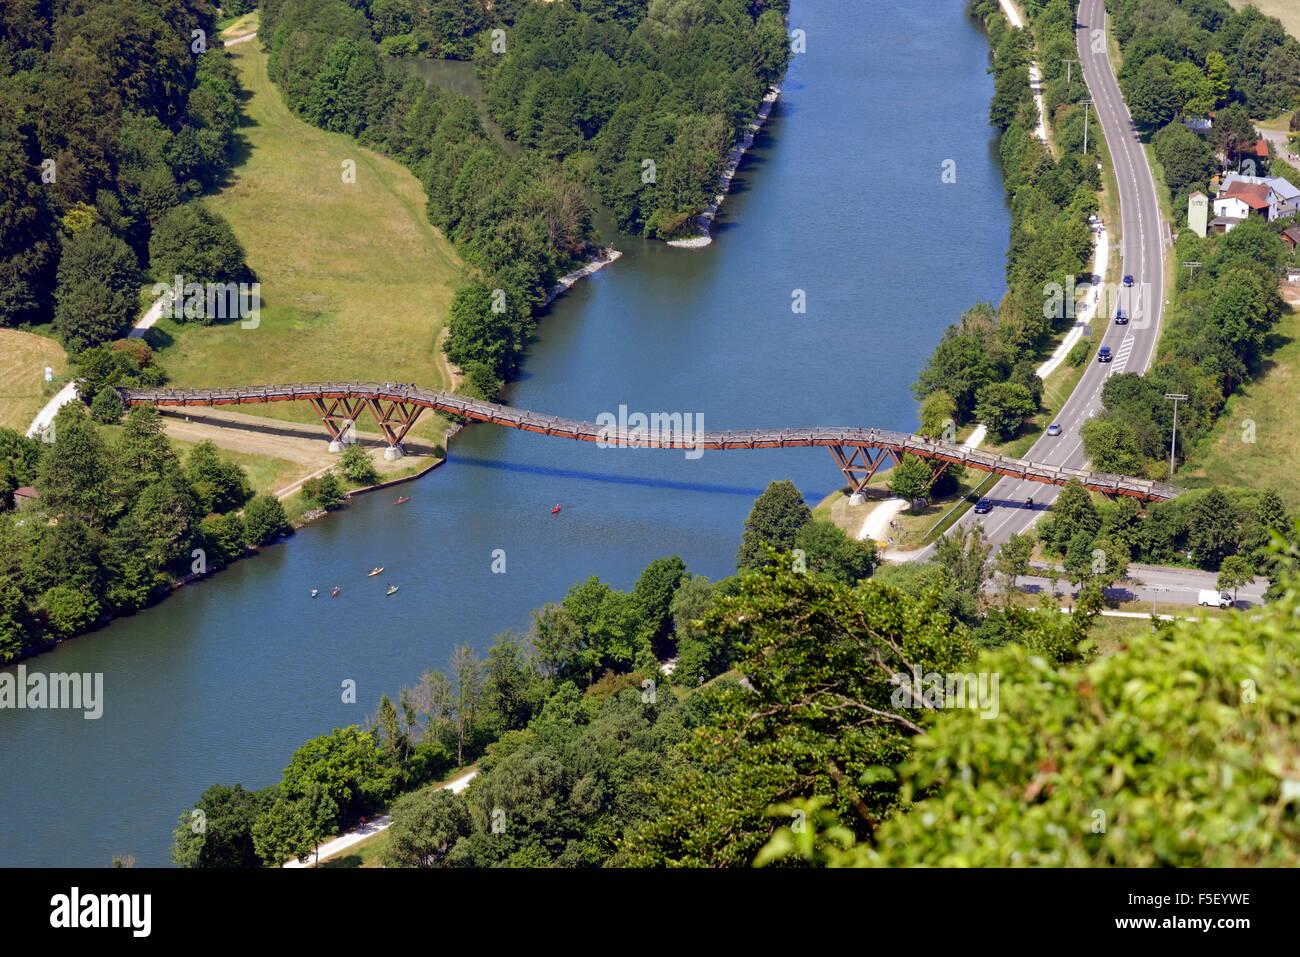 Rhine-Main-Danube Canal and Holzbrücke Tatzelwurm, catenary bridge, Essing, Bavaria, Germany - Stock Image